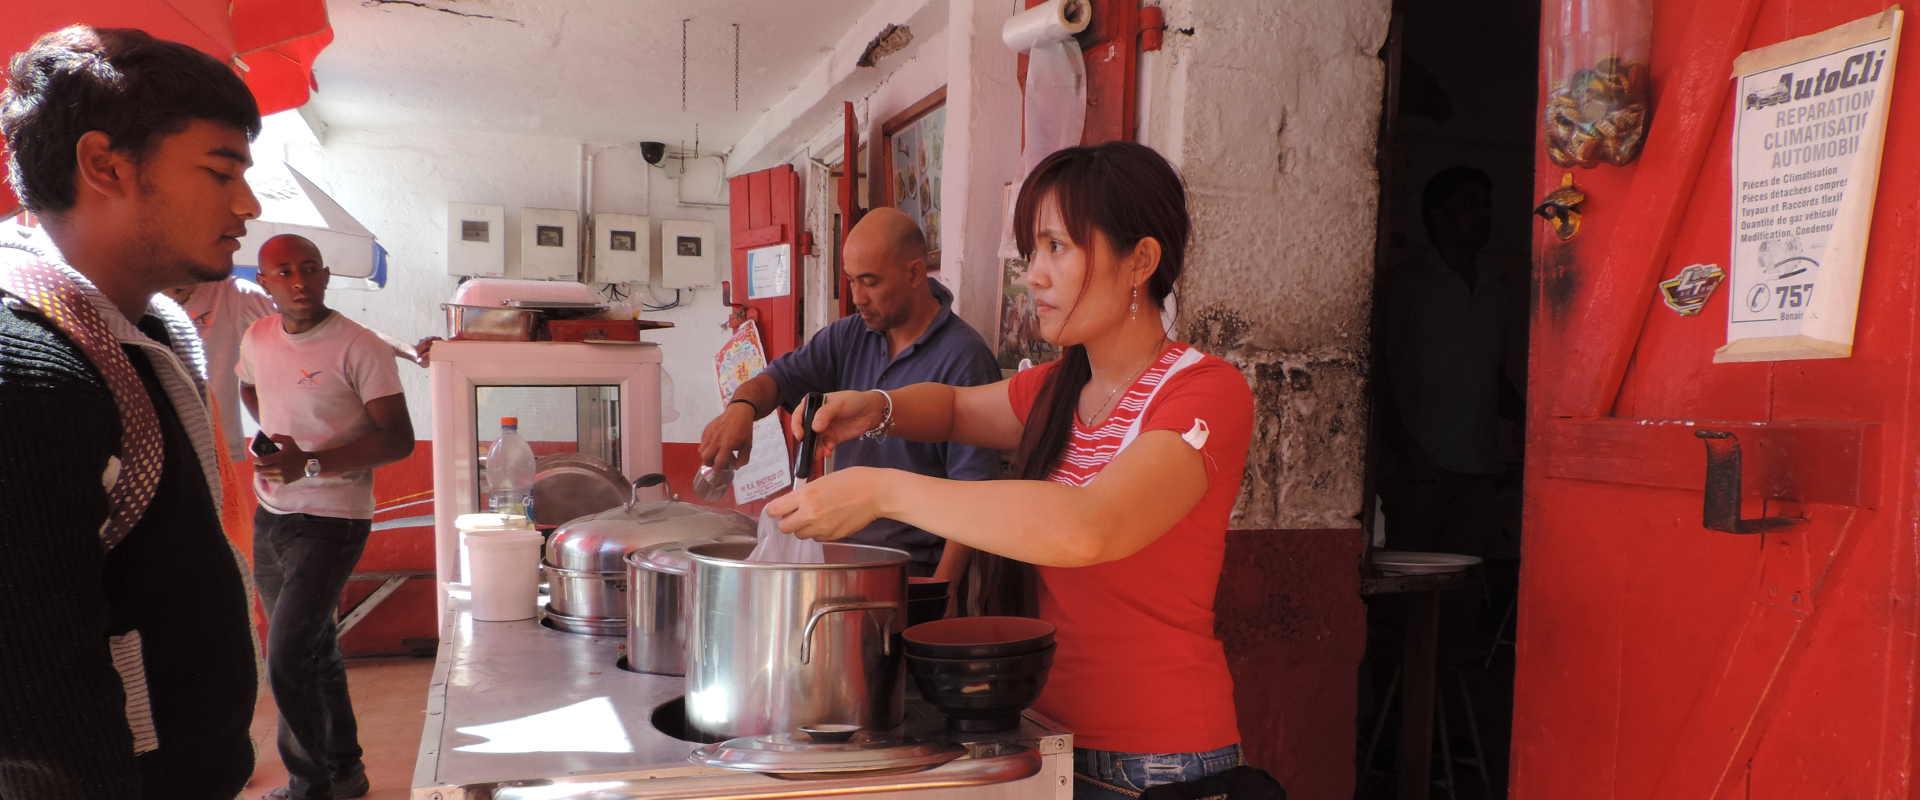 Chinese dumplings street-food Mauritius